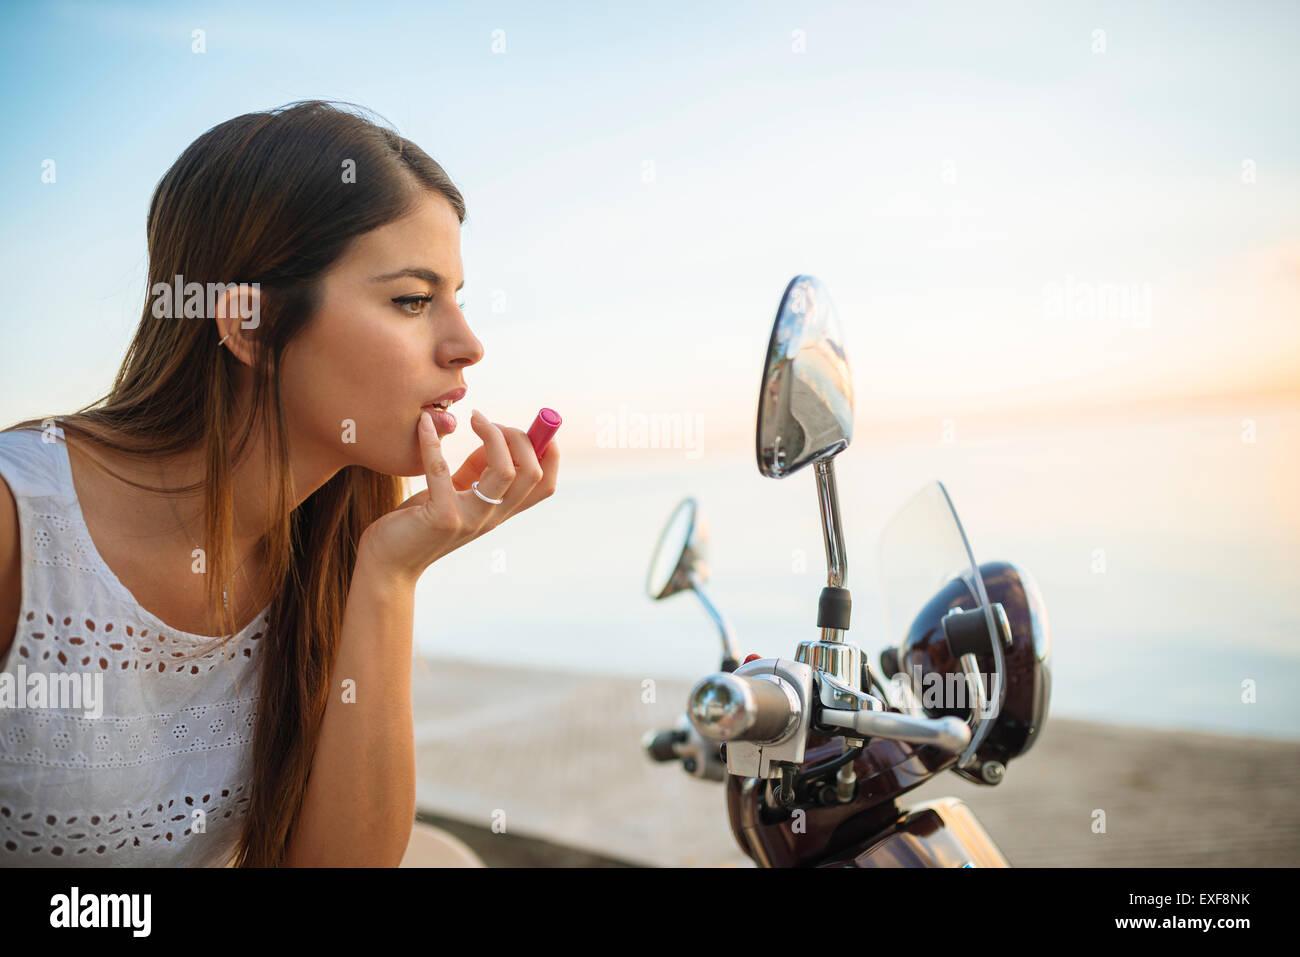 Young woman applying lipstick moto en miroir, Manille, Philippines Photo Stock